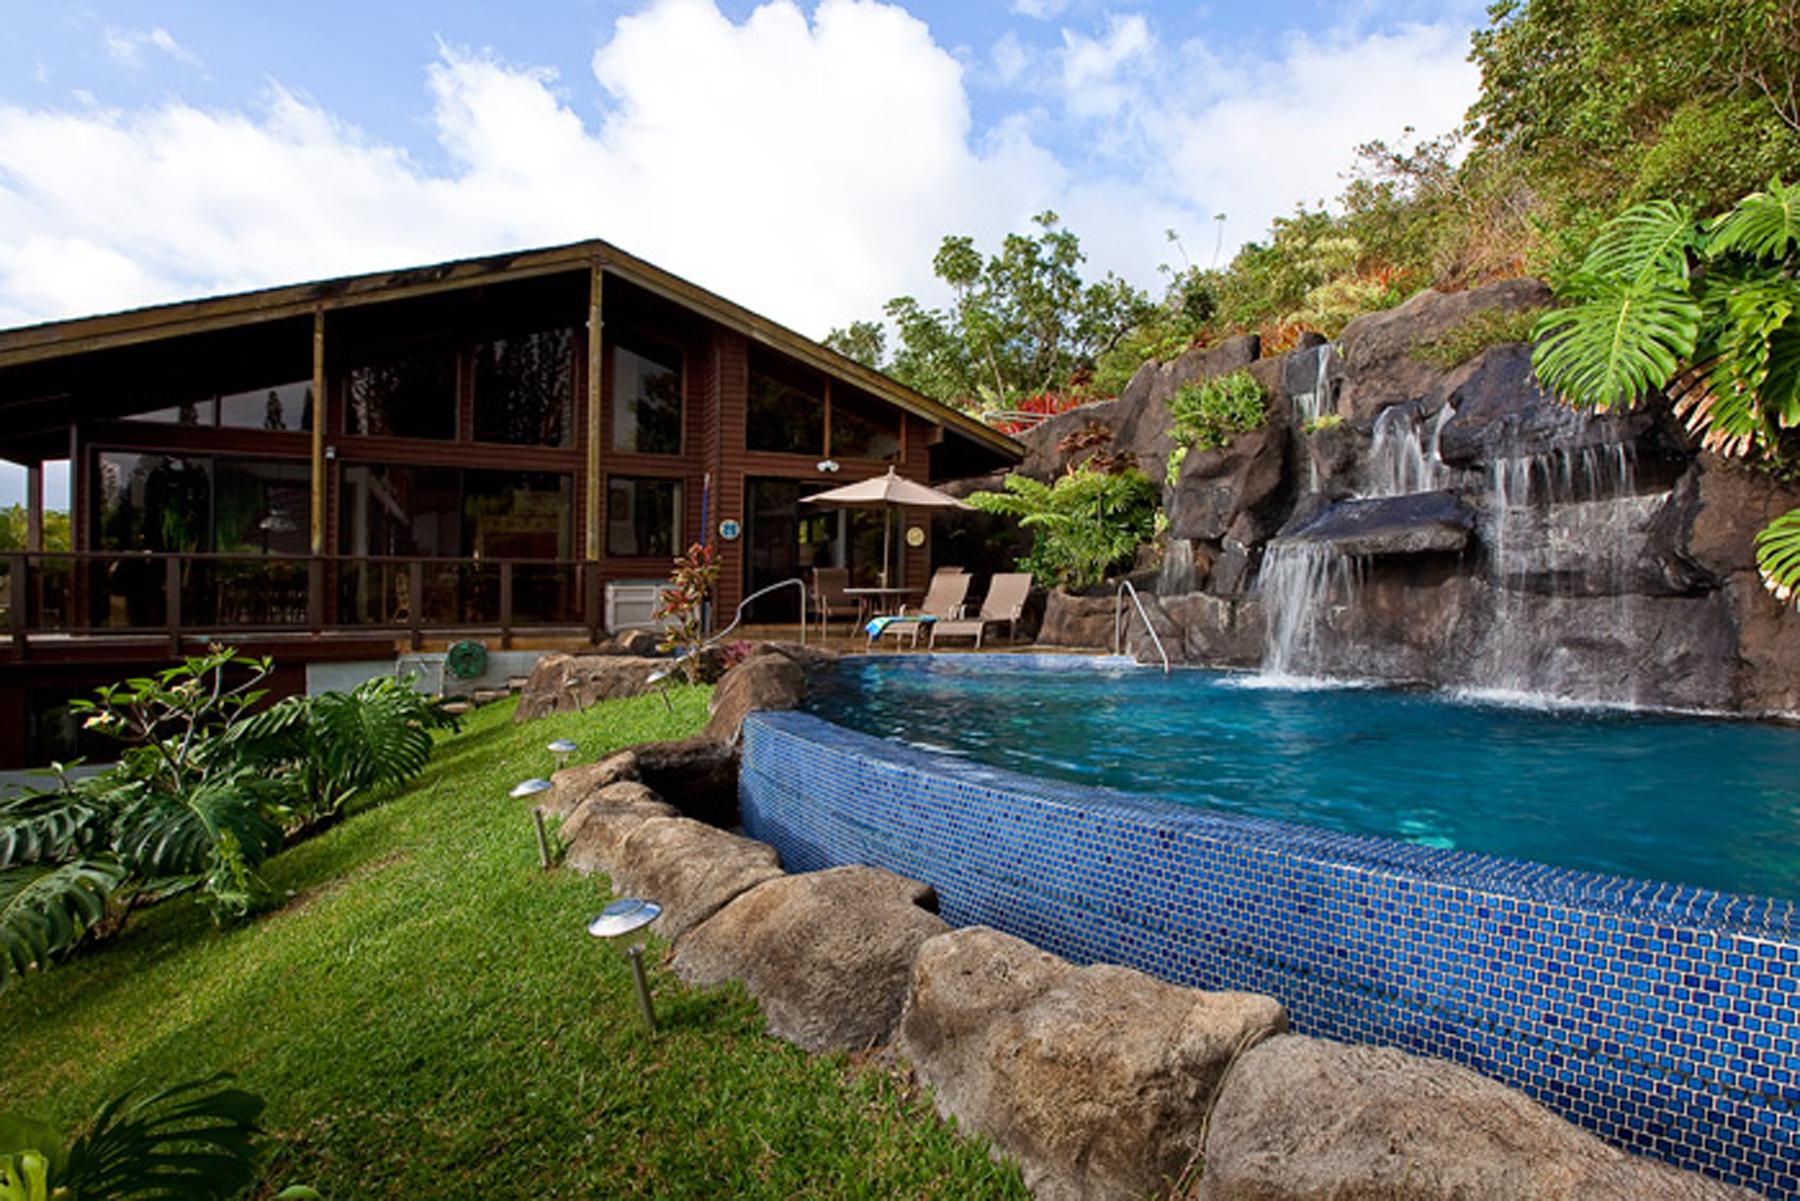 Single Family Home for Sale at 21 Acre Kahalu'u Country Estate 47-561 Mapele Road Kaneohe, Hawaii, 96744 United States